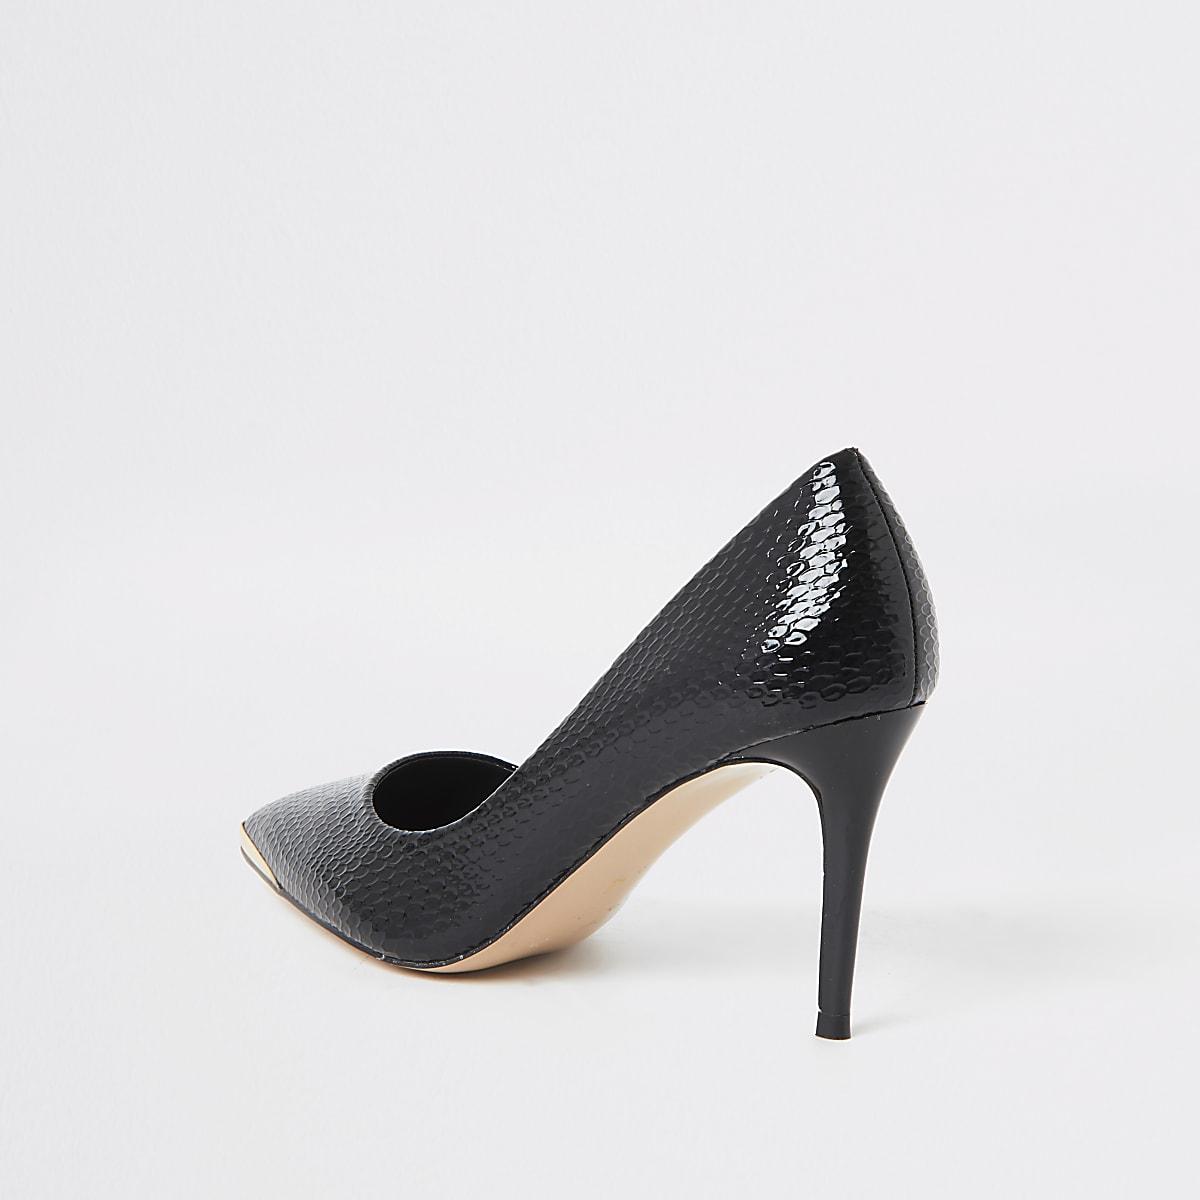 80780884360 Black point toe croc mid heel court shoes